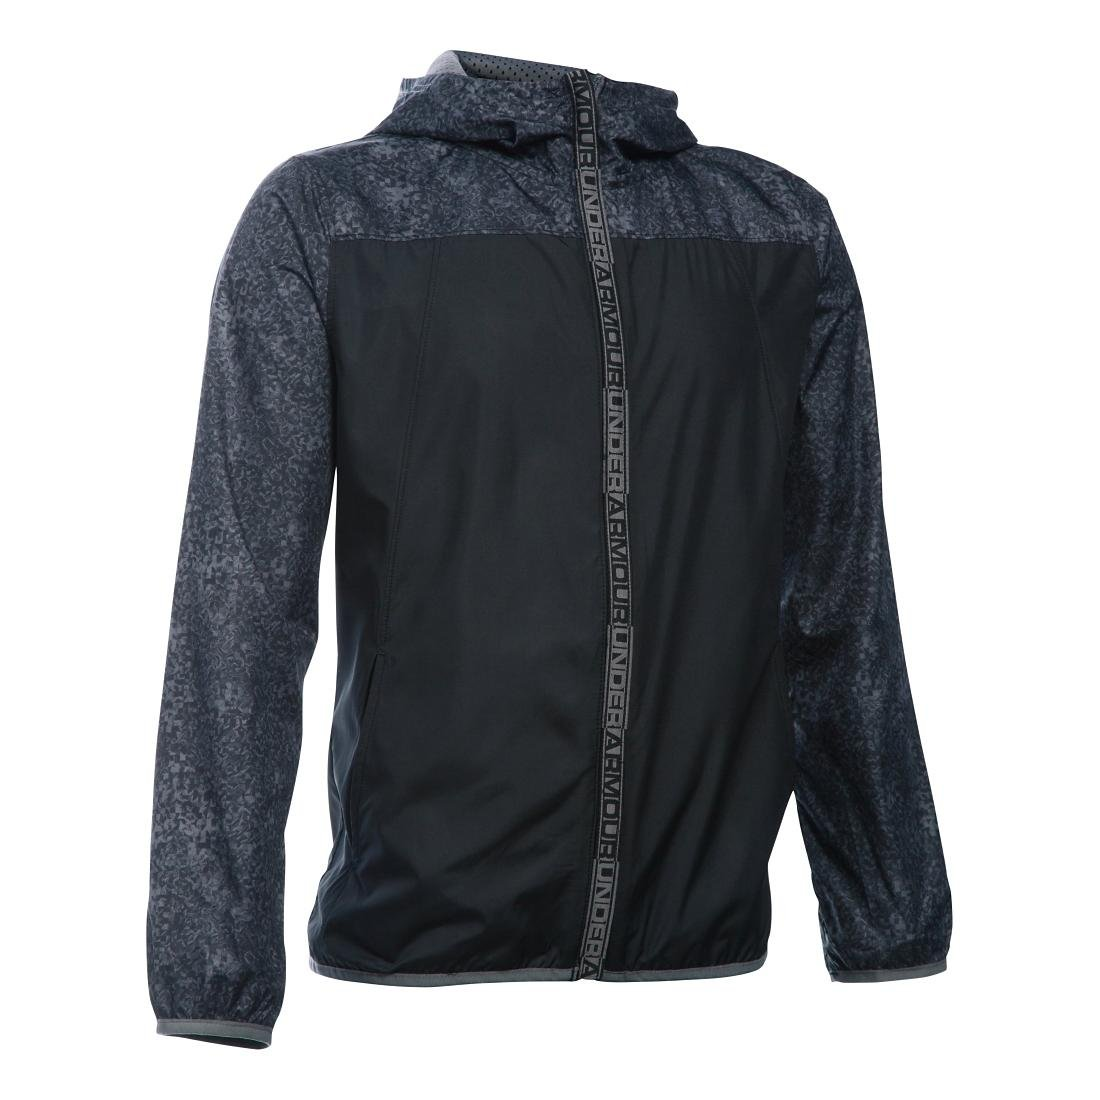 Under Armour Boys UA Storm Packable Woven Jacket